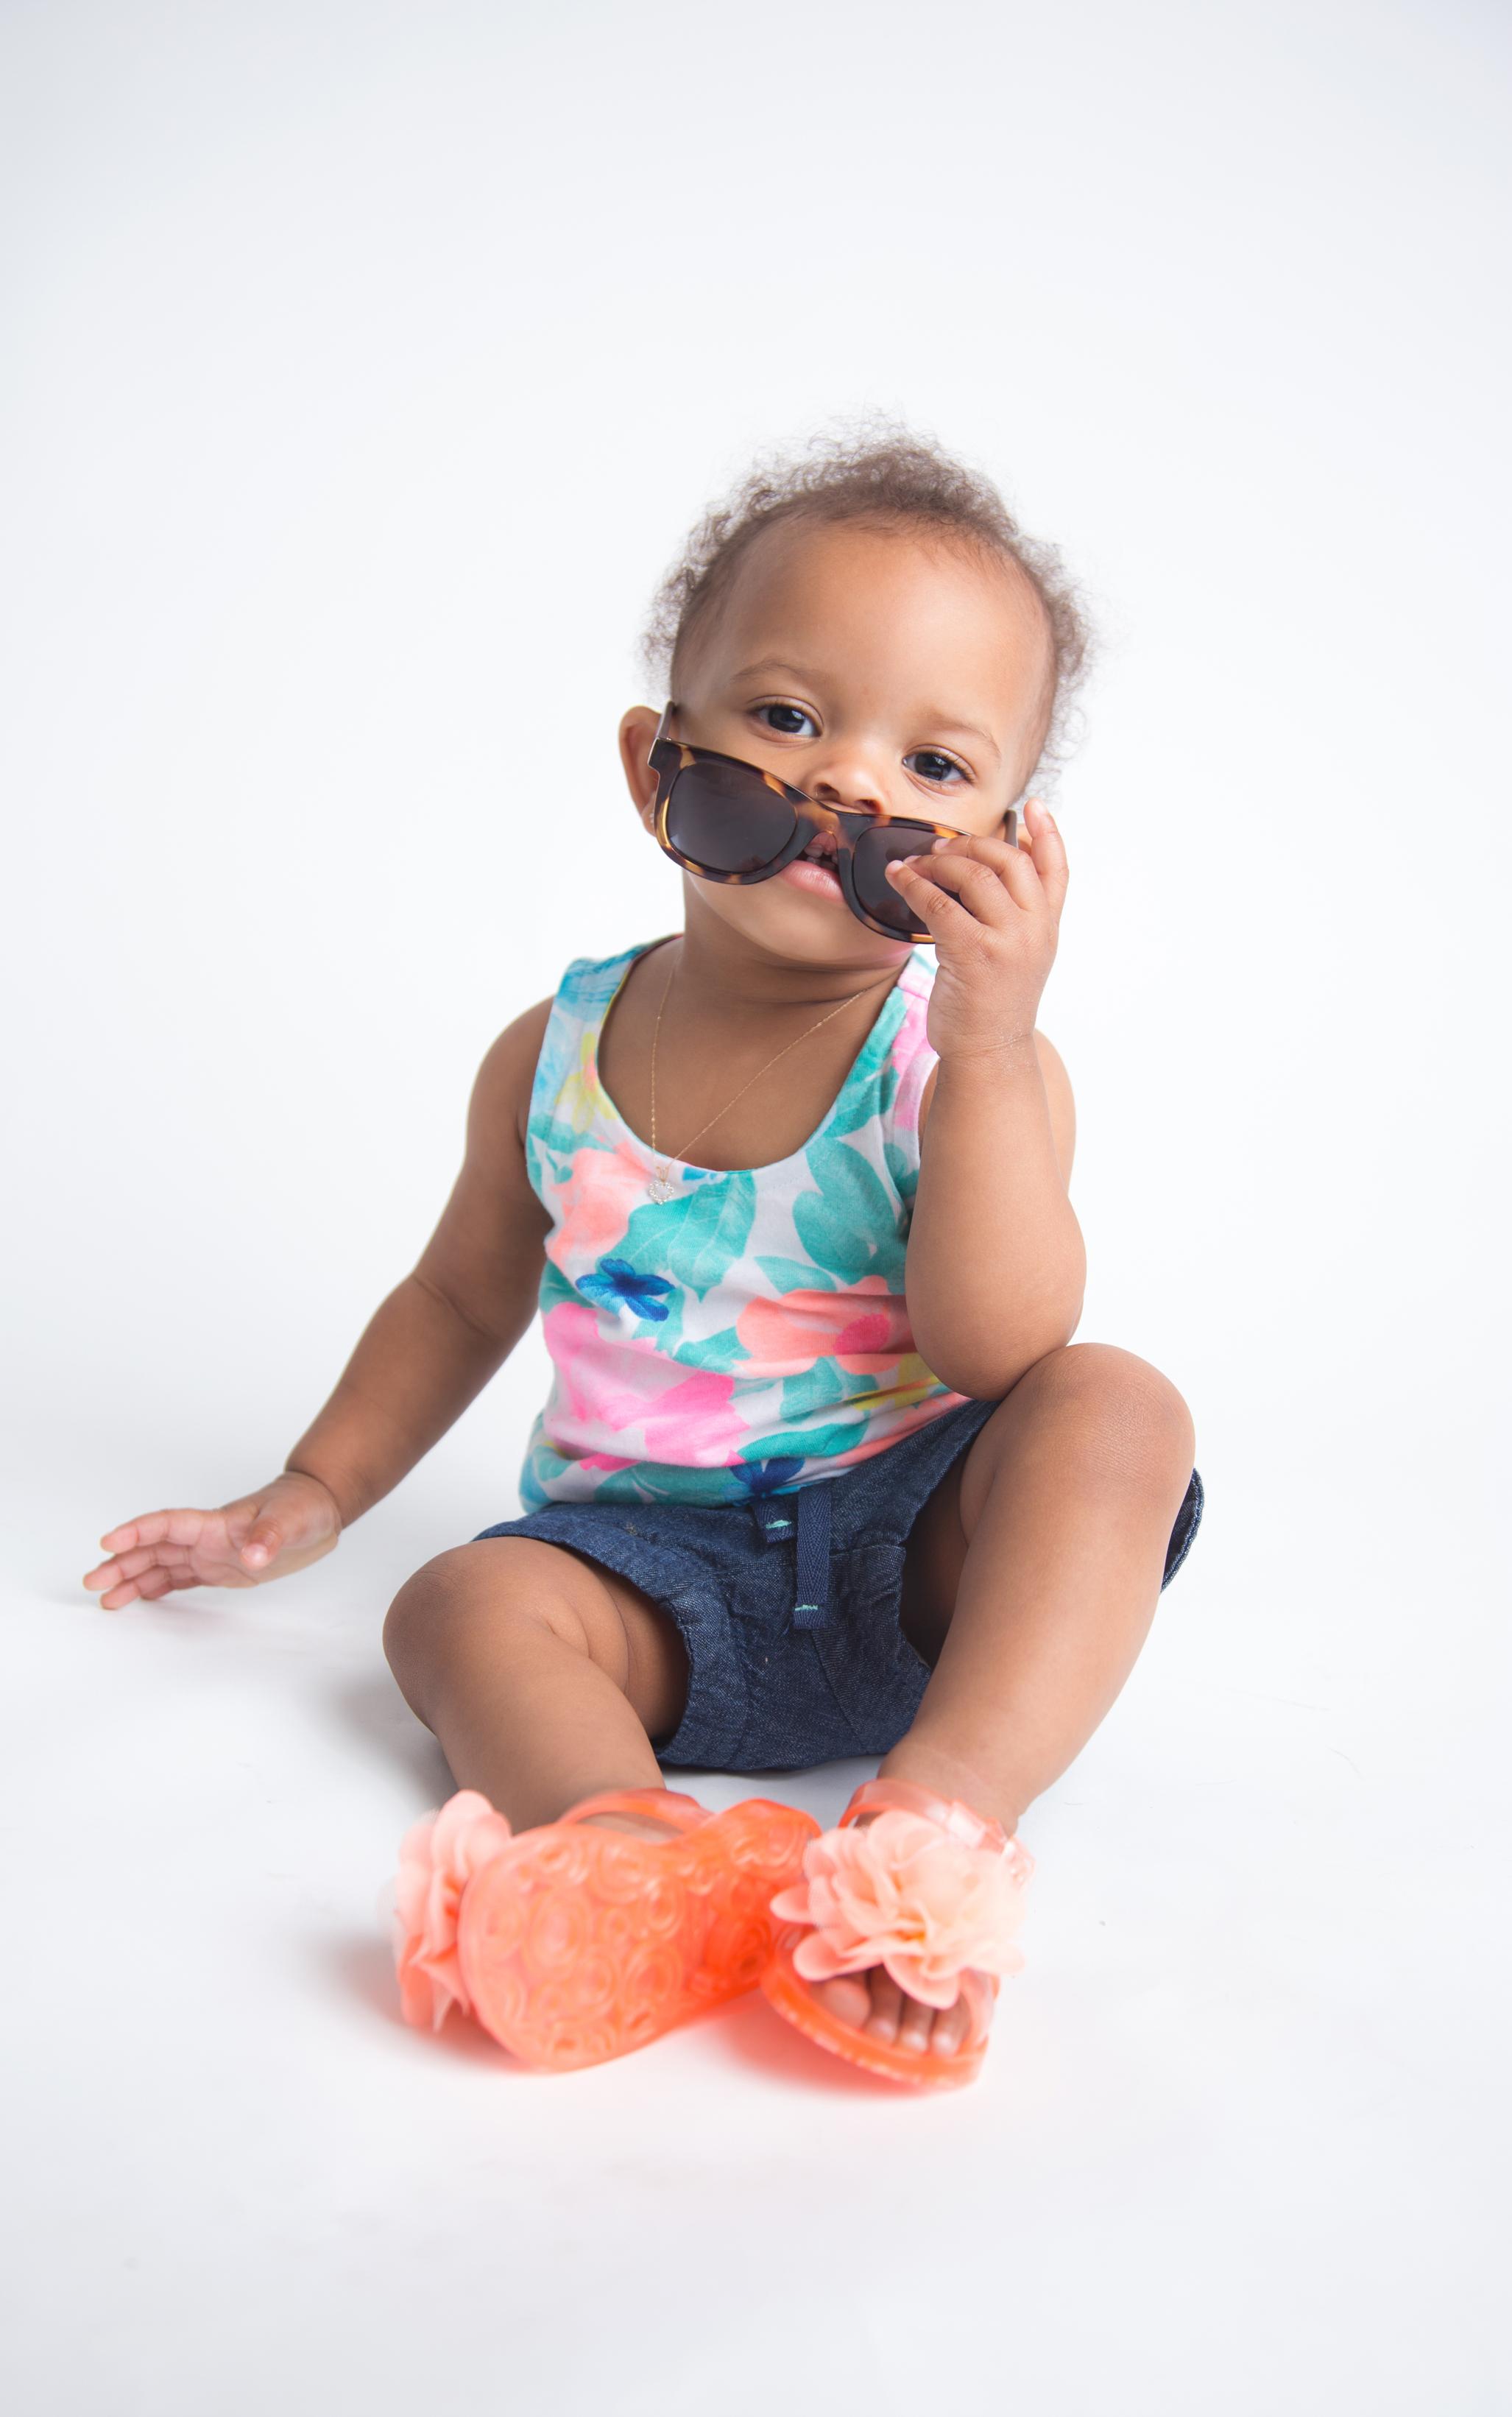 baby-photo-shoot-chamber-photography-antoine-hart.jpg